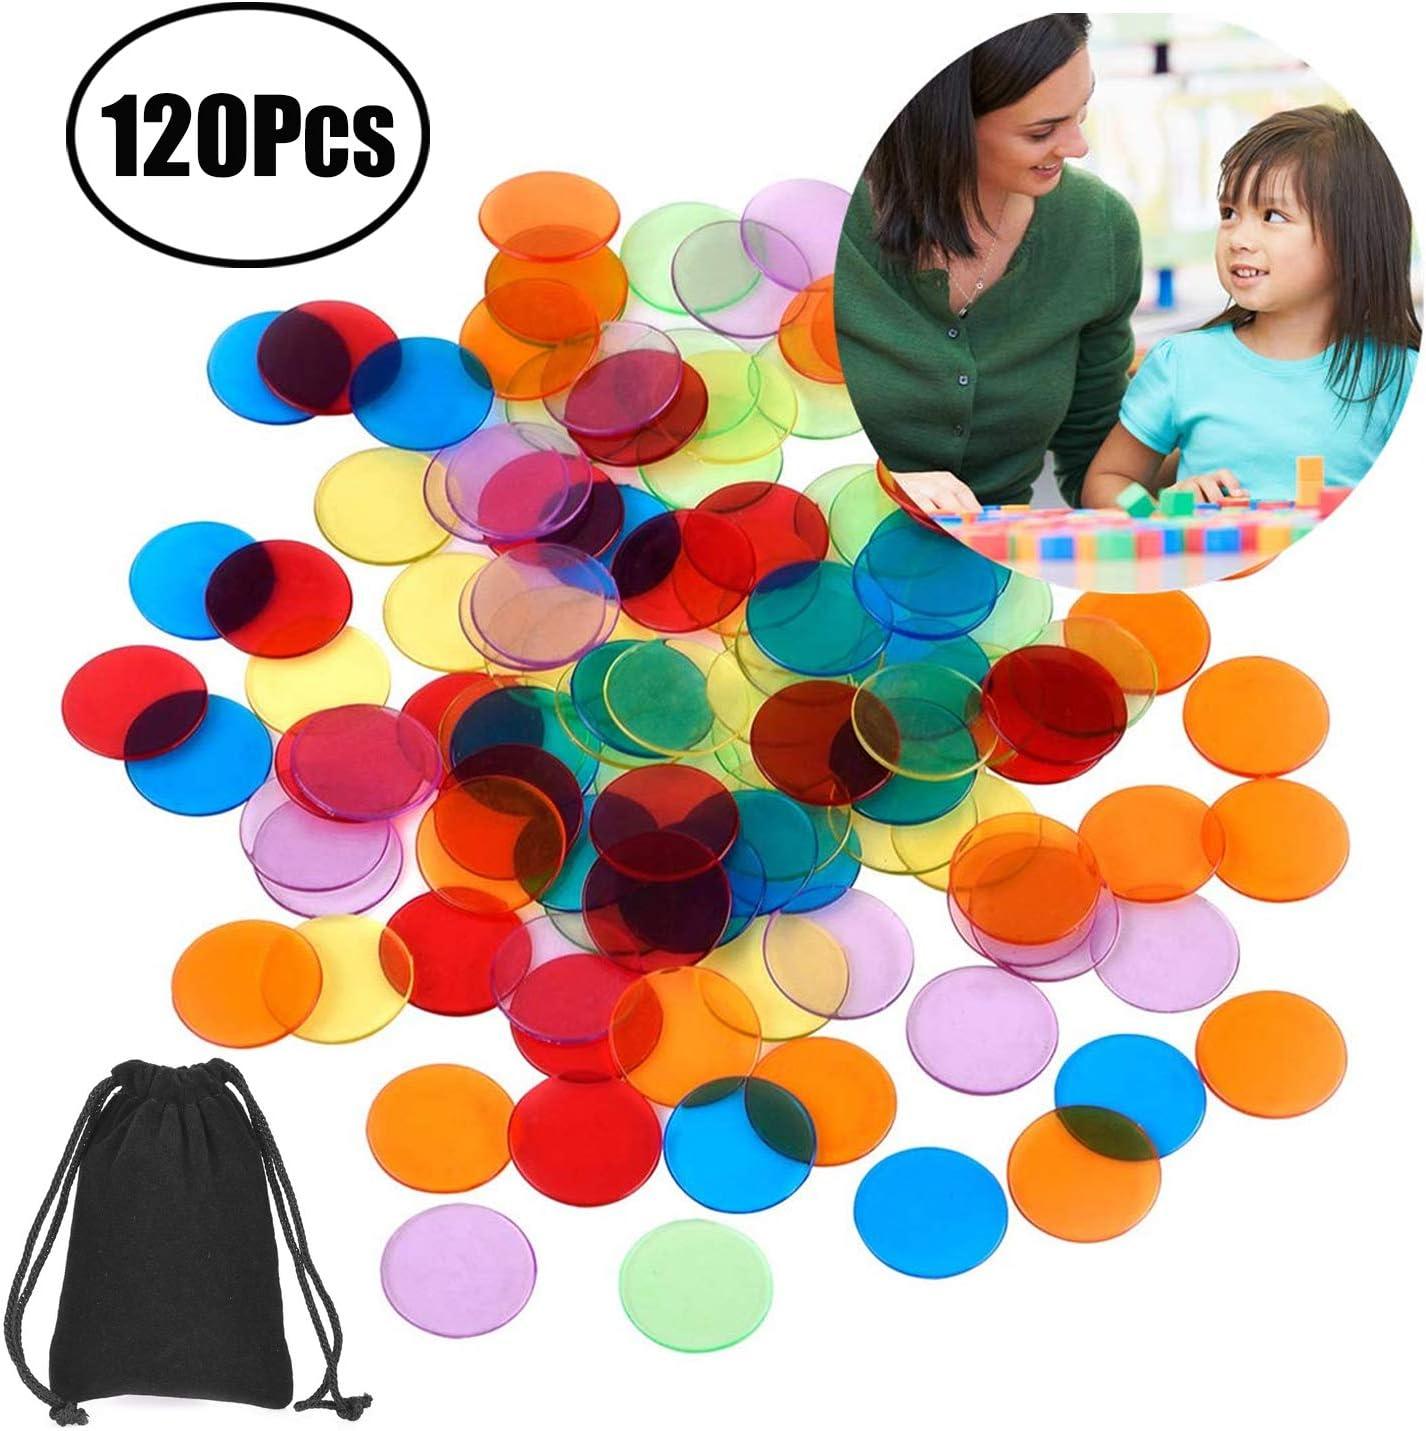 Lvcky - 120 marcadores de plástico transparentes para contar, fichas de bingo con bolsa de almacenamiento